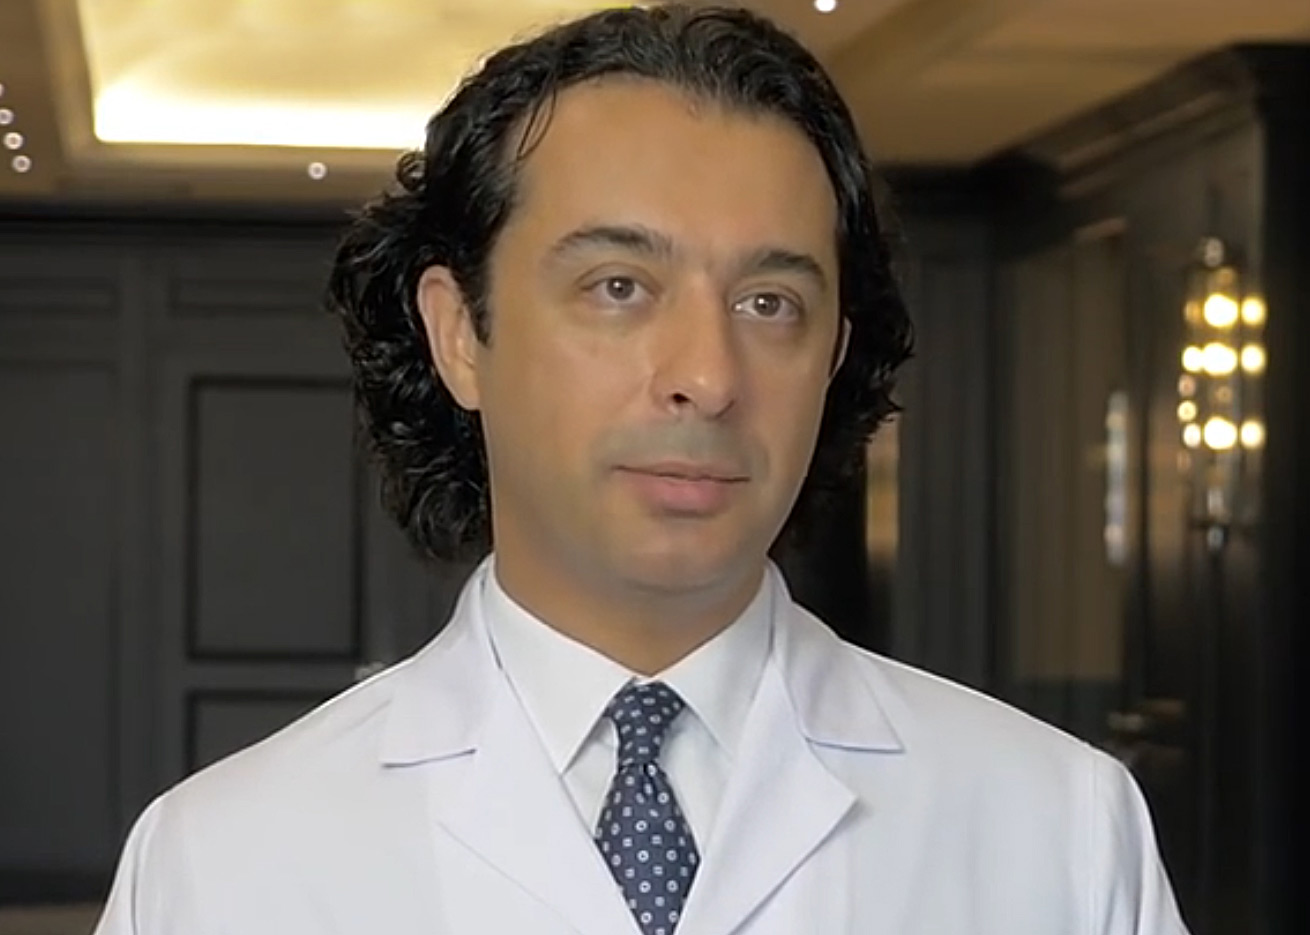 Ass. Prof. Dr. Ali Timucin Atayoglu